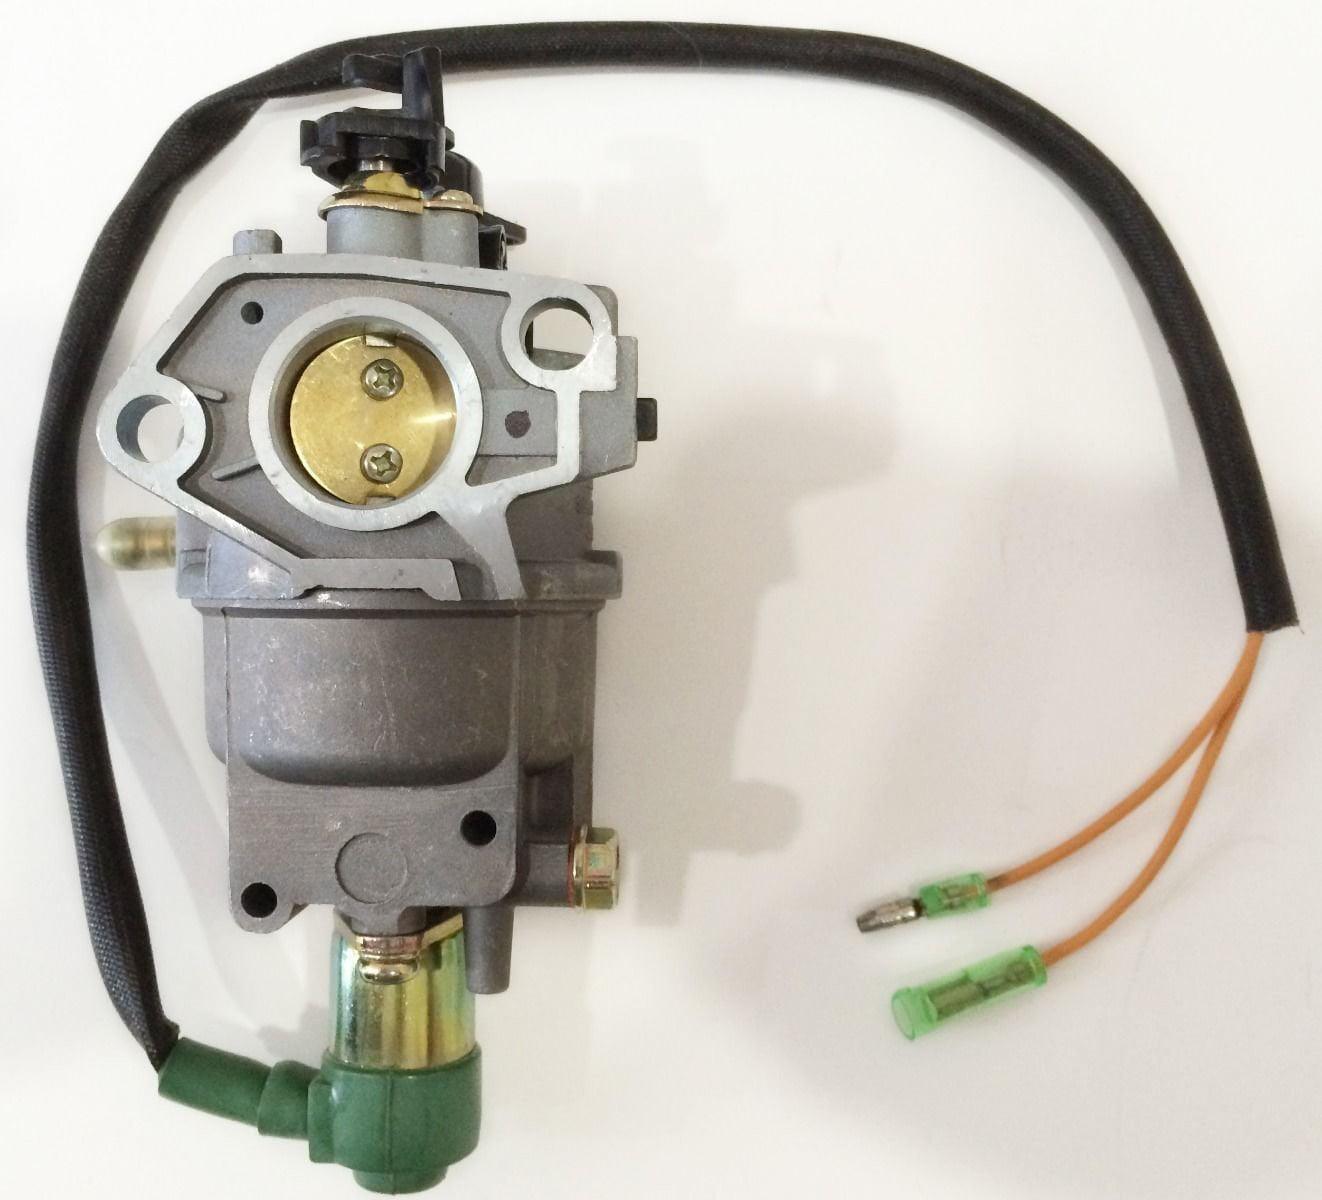 Fits All Power America Steele Gentron JF420-I-04B Generator Carburetor  Assembly - Walmart.com